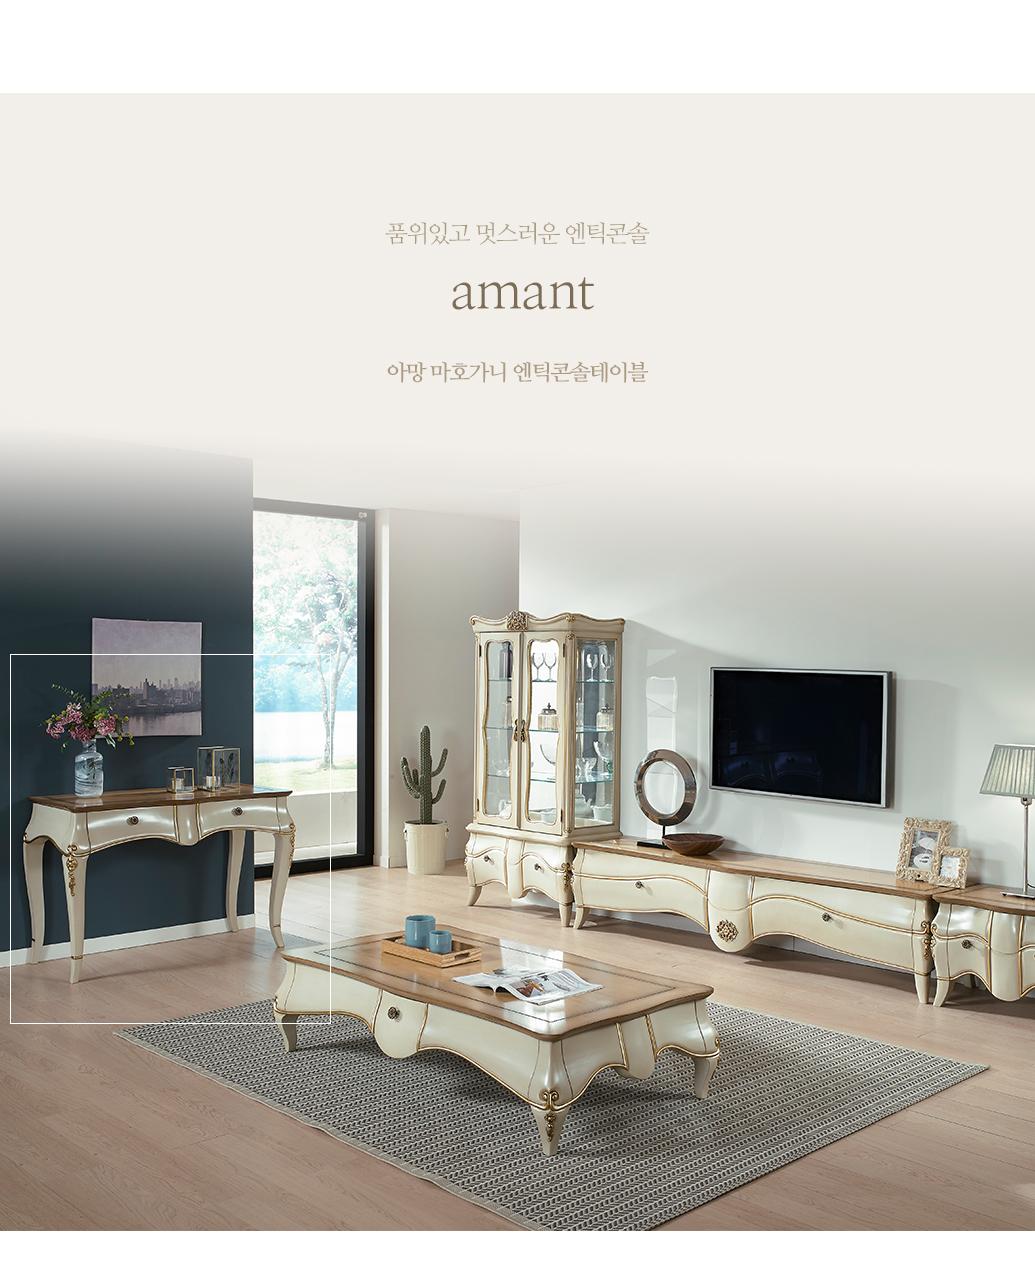 amant_01.jpg